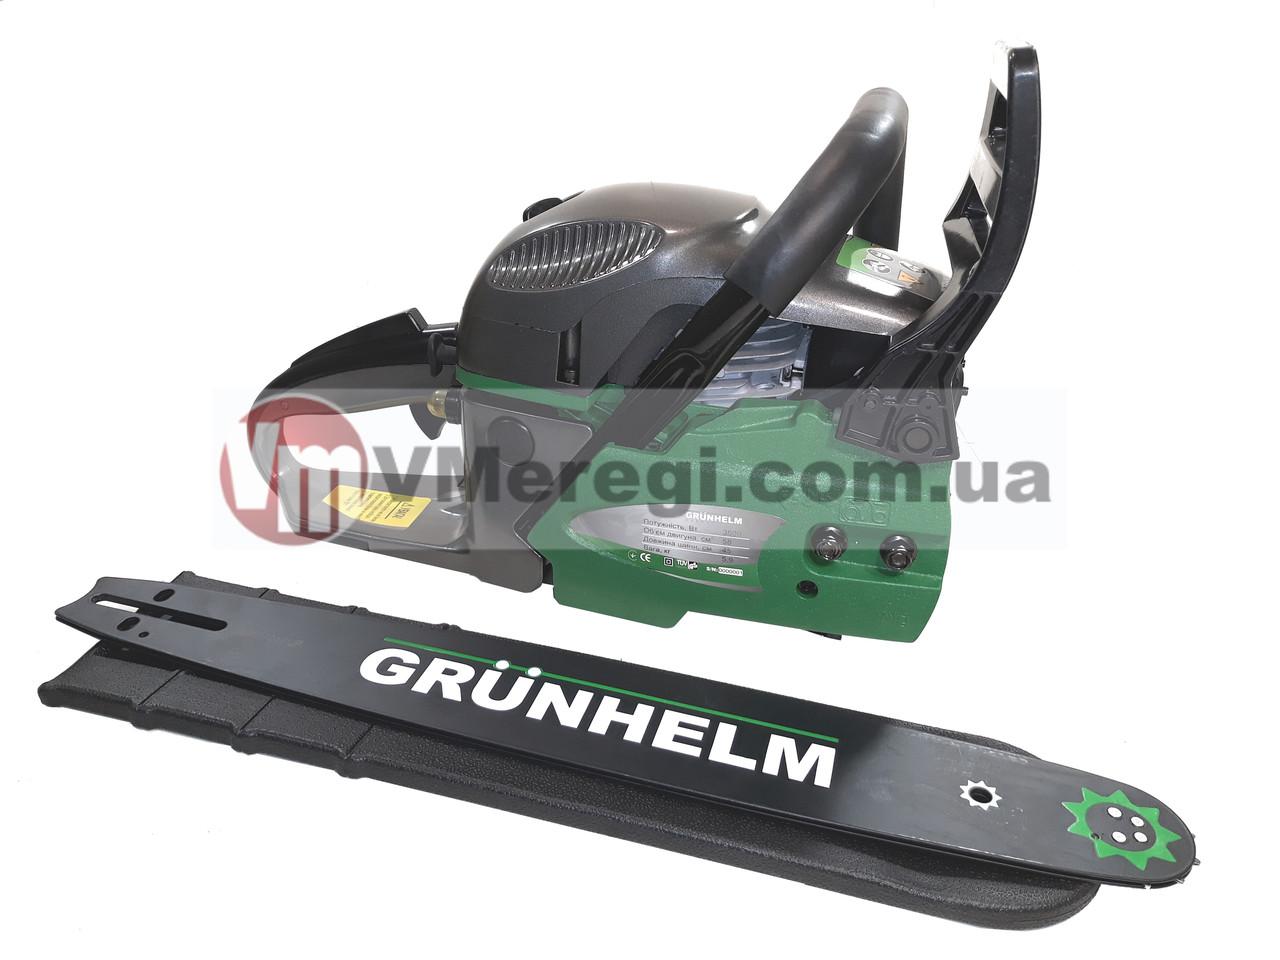 Бензопила цепная Grunhelm GS62-18/2 Professional (2 цепи, 2 шины)